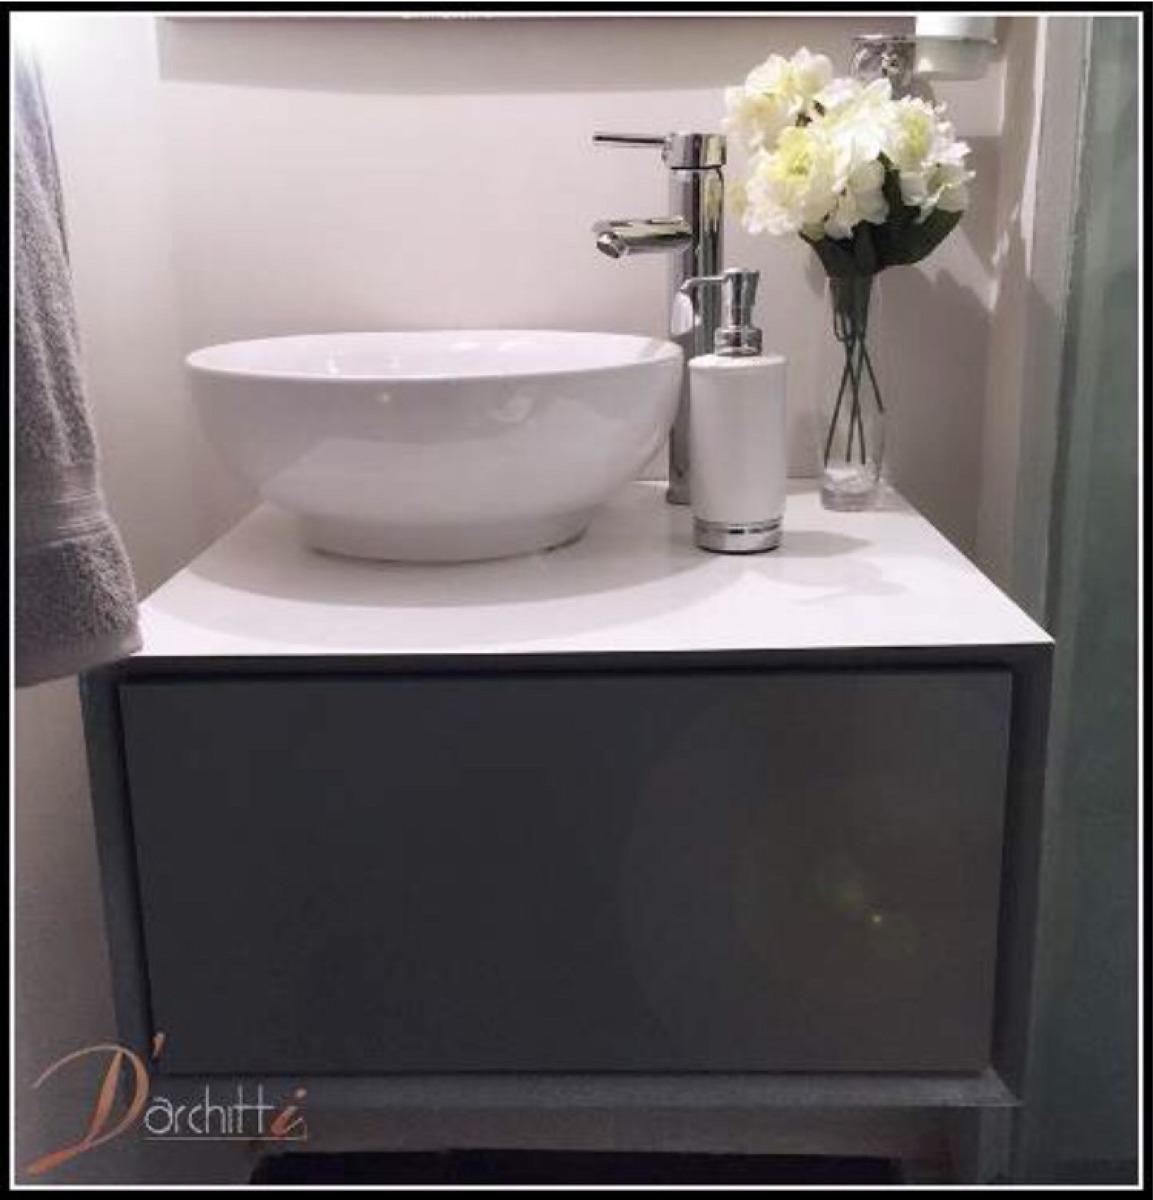 Mueble de ba o empotrar minimalista moderno ovalin - Mueble de bano diseno ...